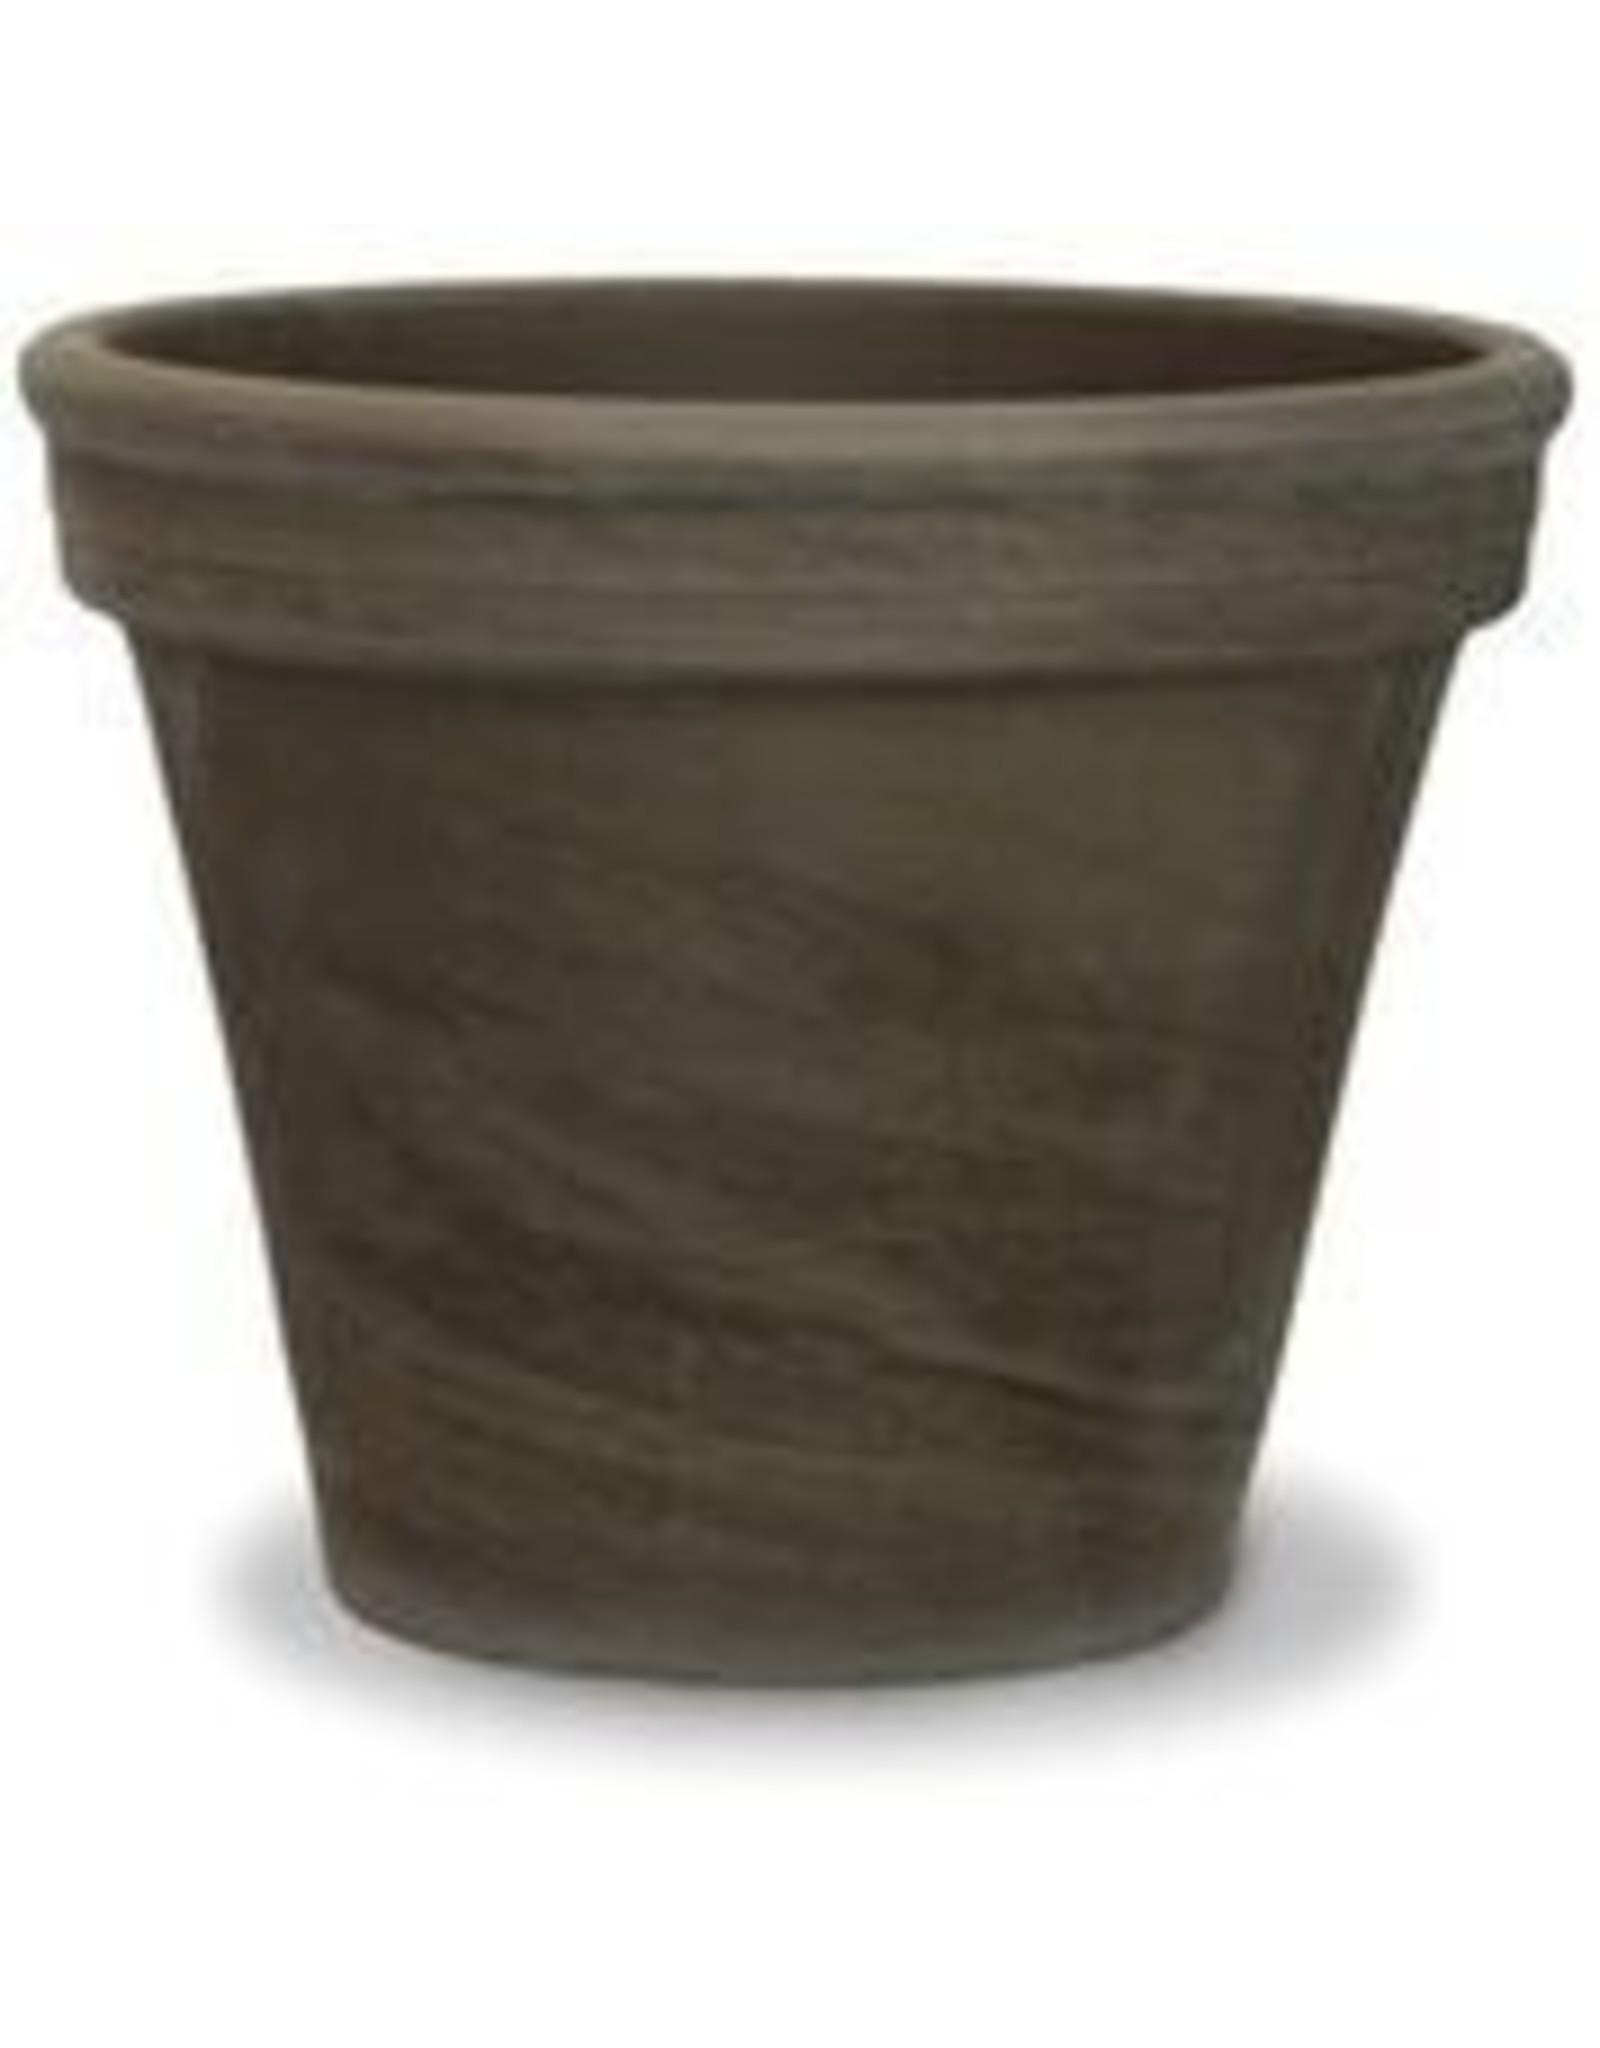 Terra Cotta Pot - Gray Clay